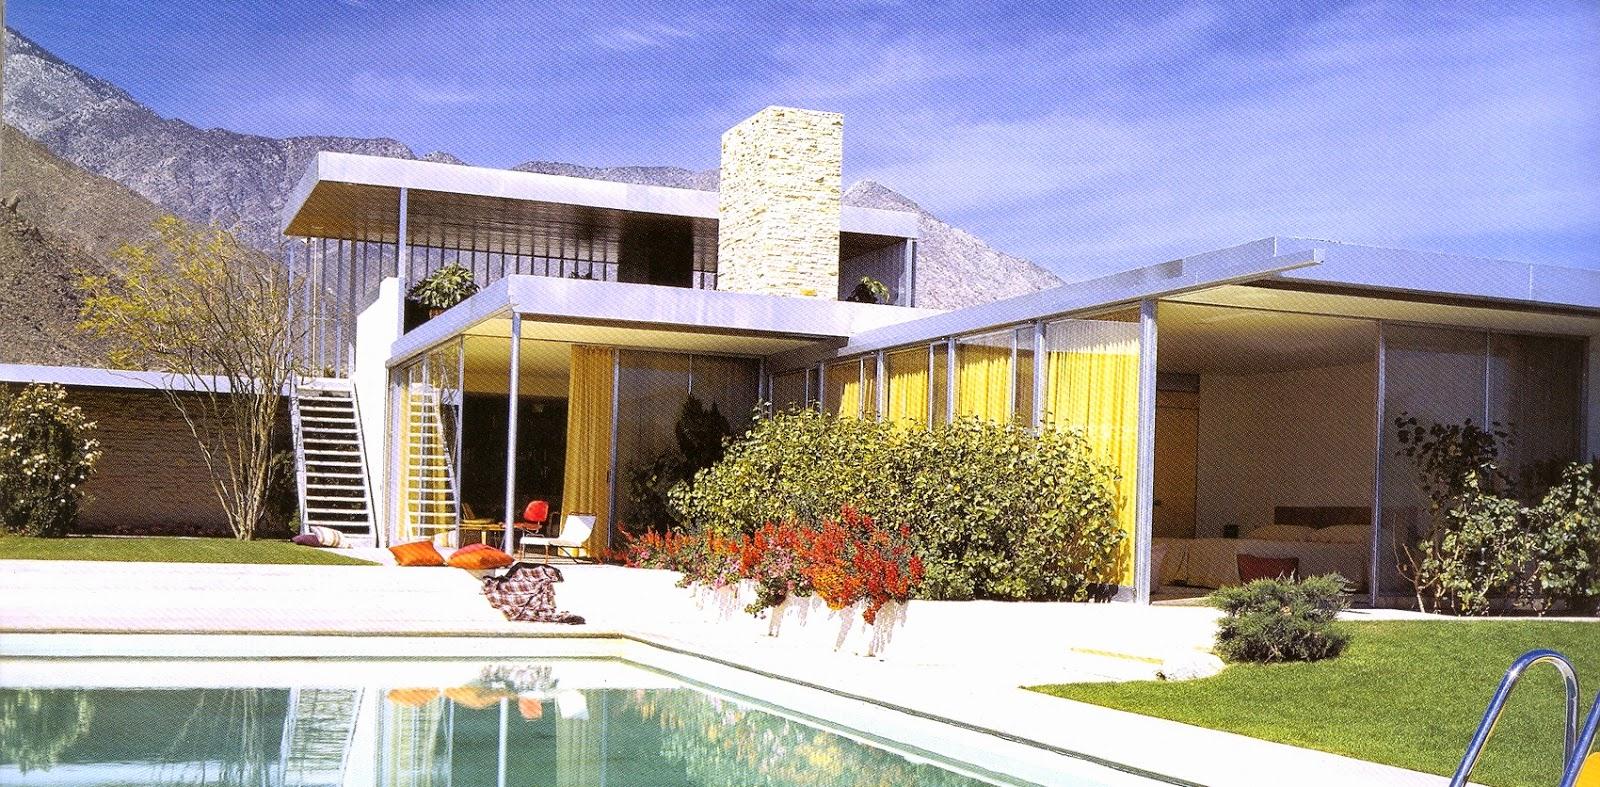 Cinco viviendas de estilo californiano revista for Estilos de viviendas